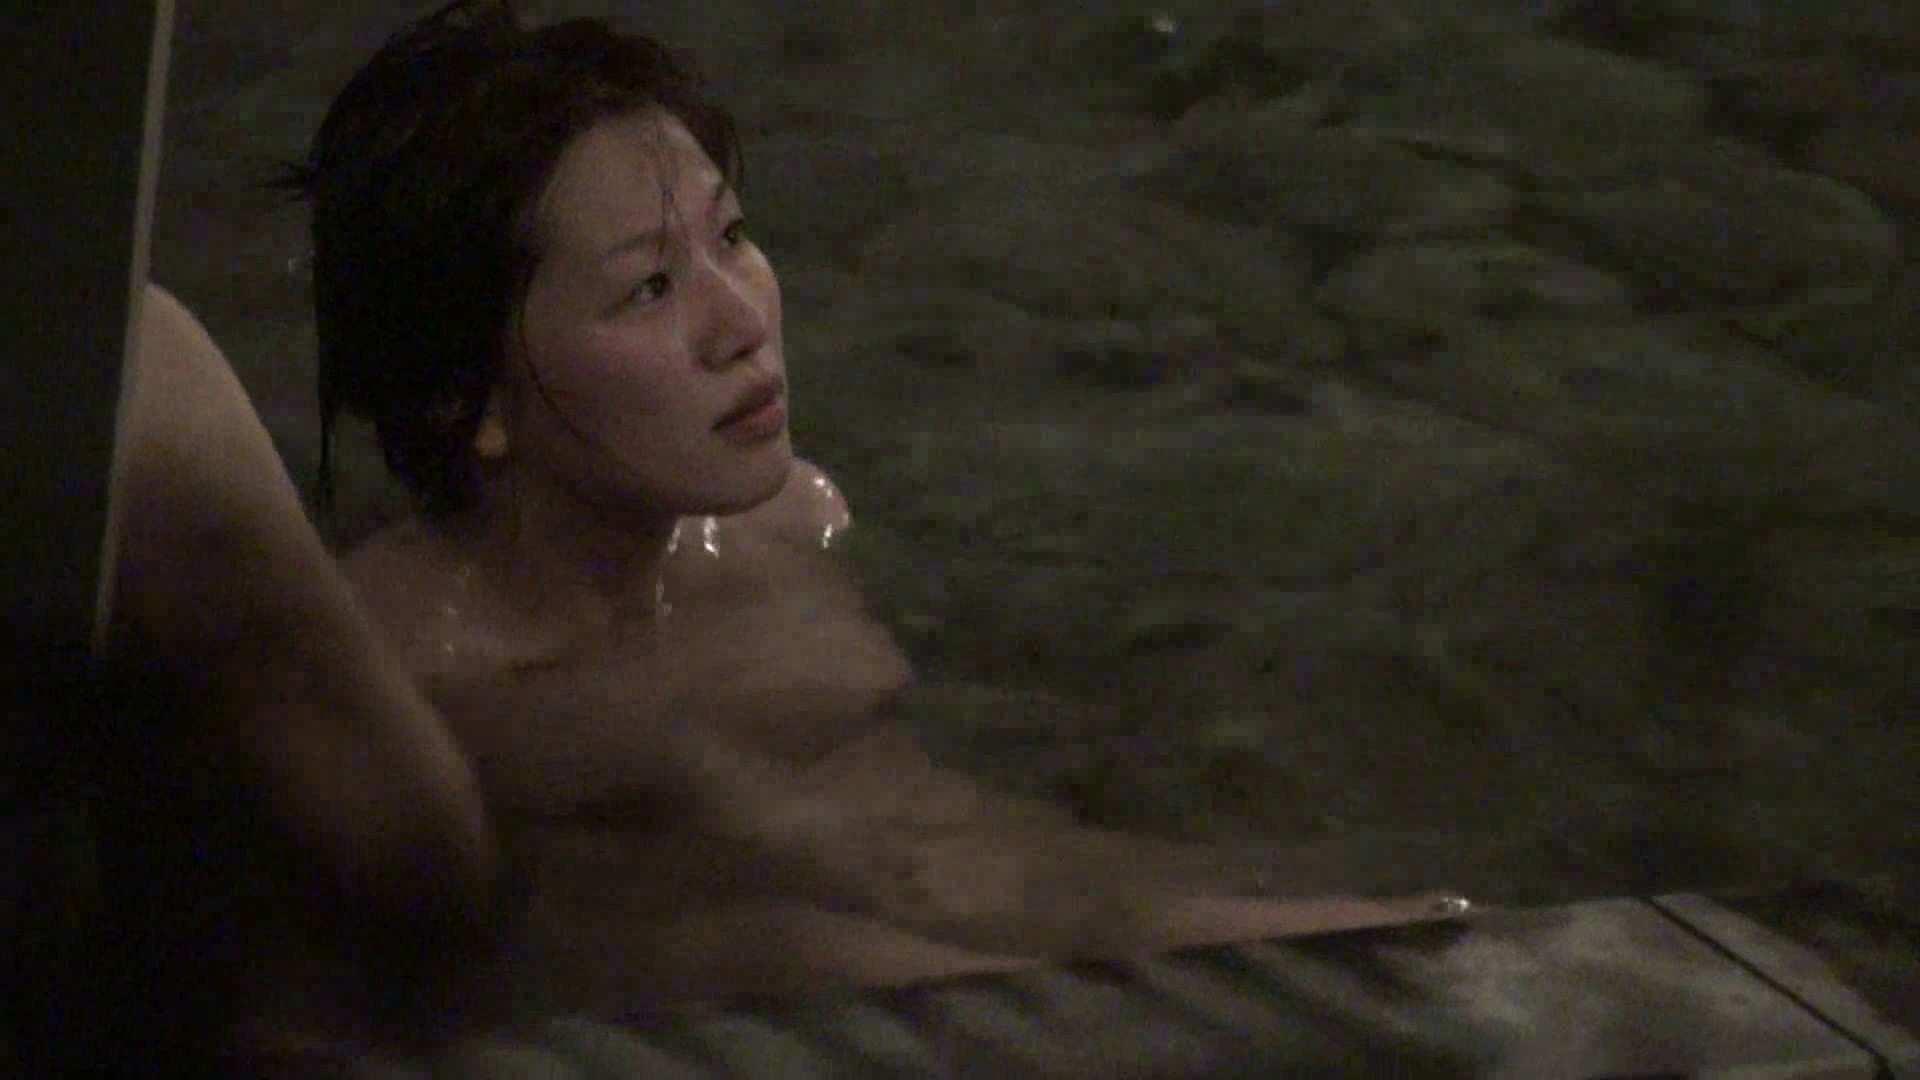 Aquaな露天風呂Vol.387 0  45連発 6